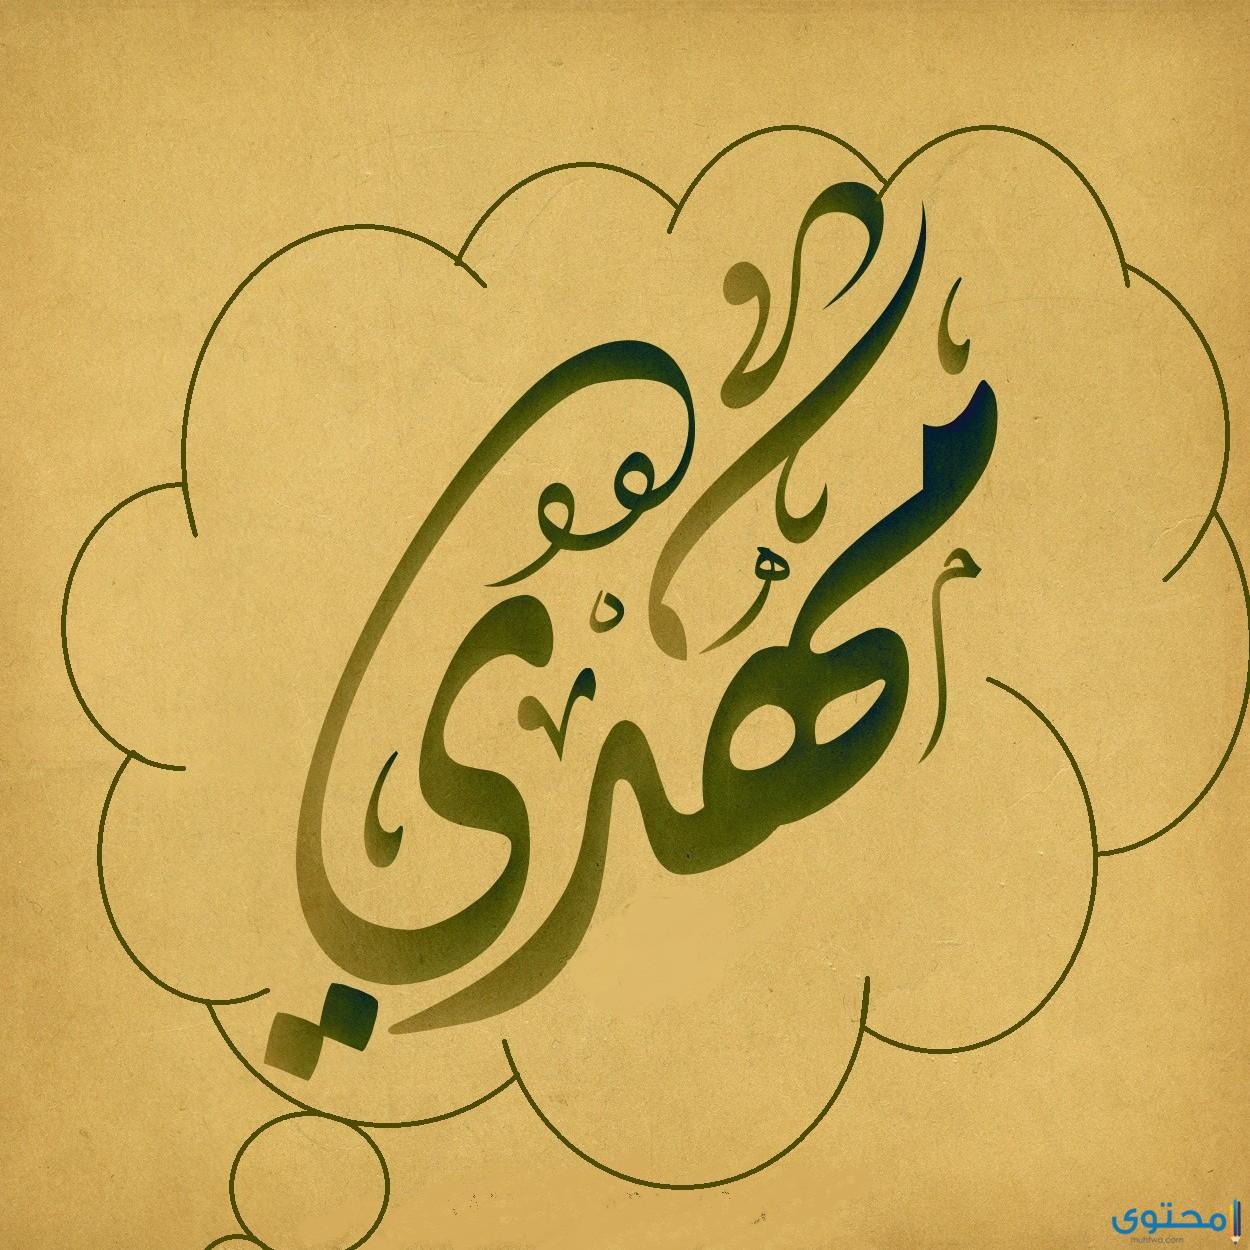 ما معنى اسم مهدي Mahdi وما